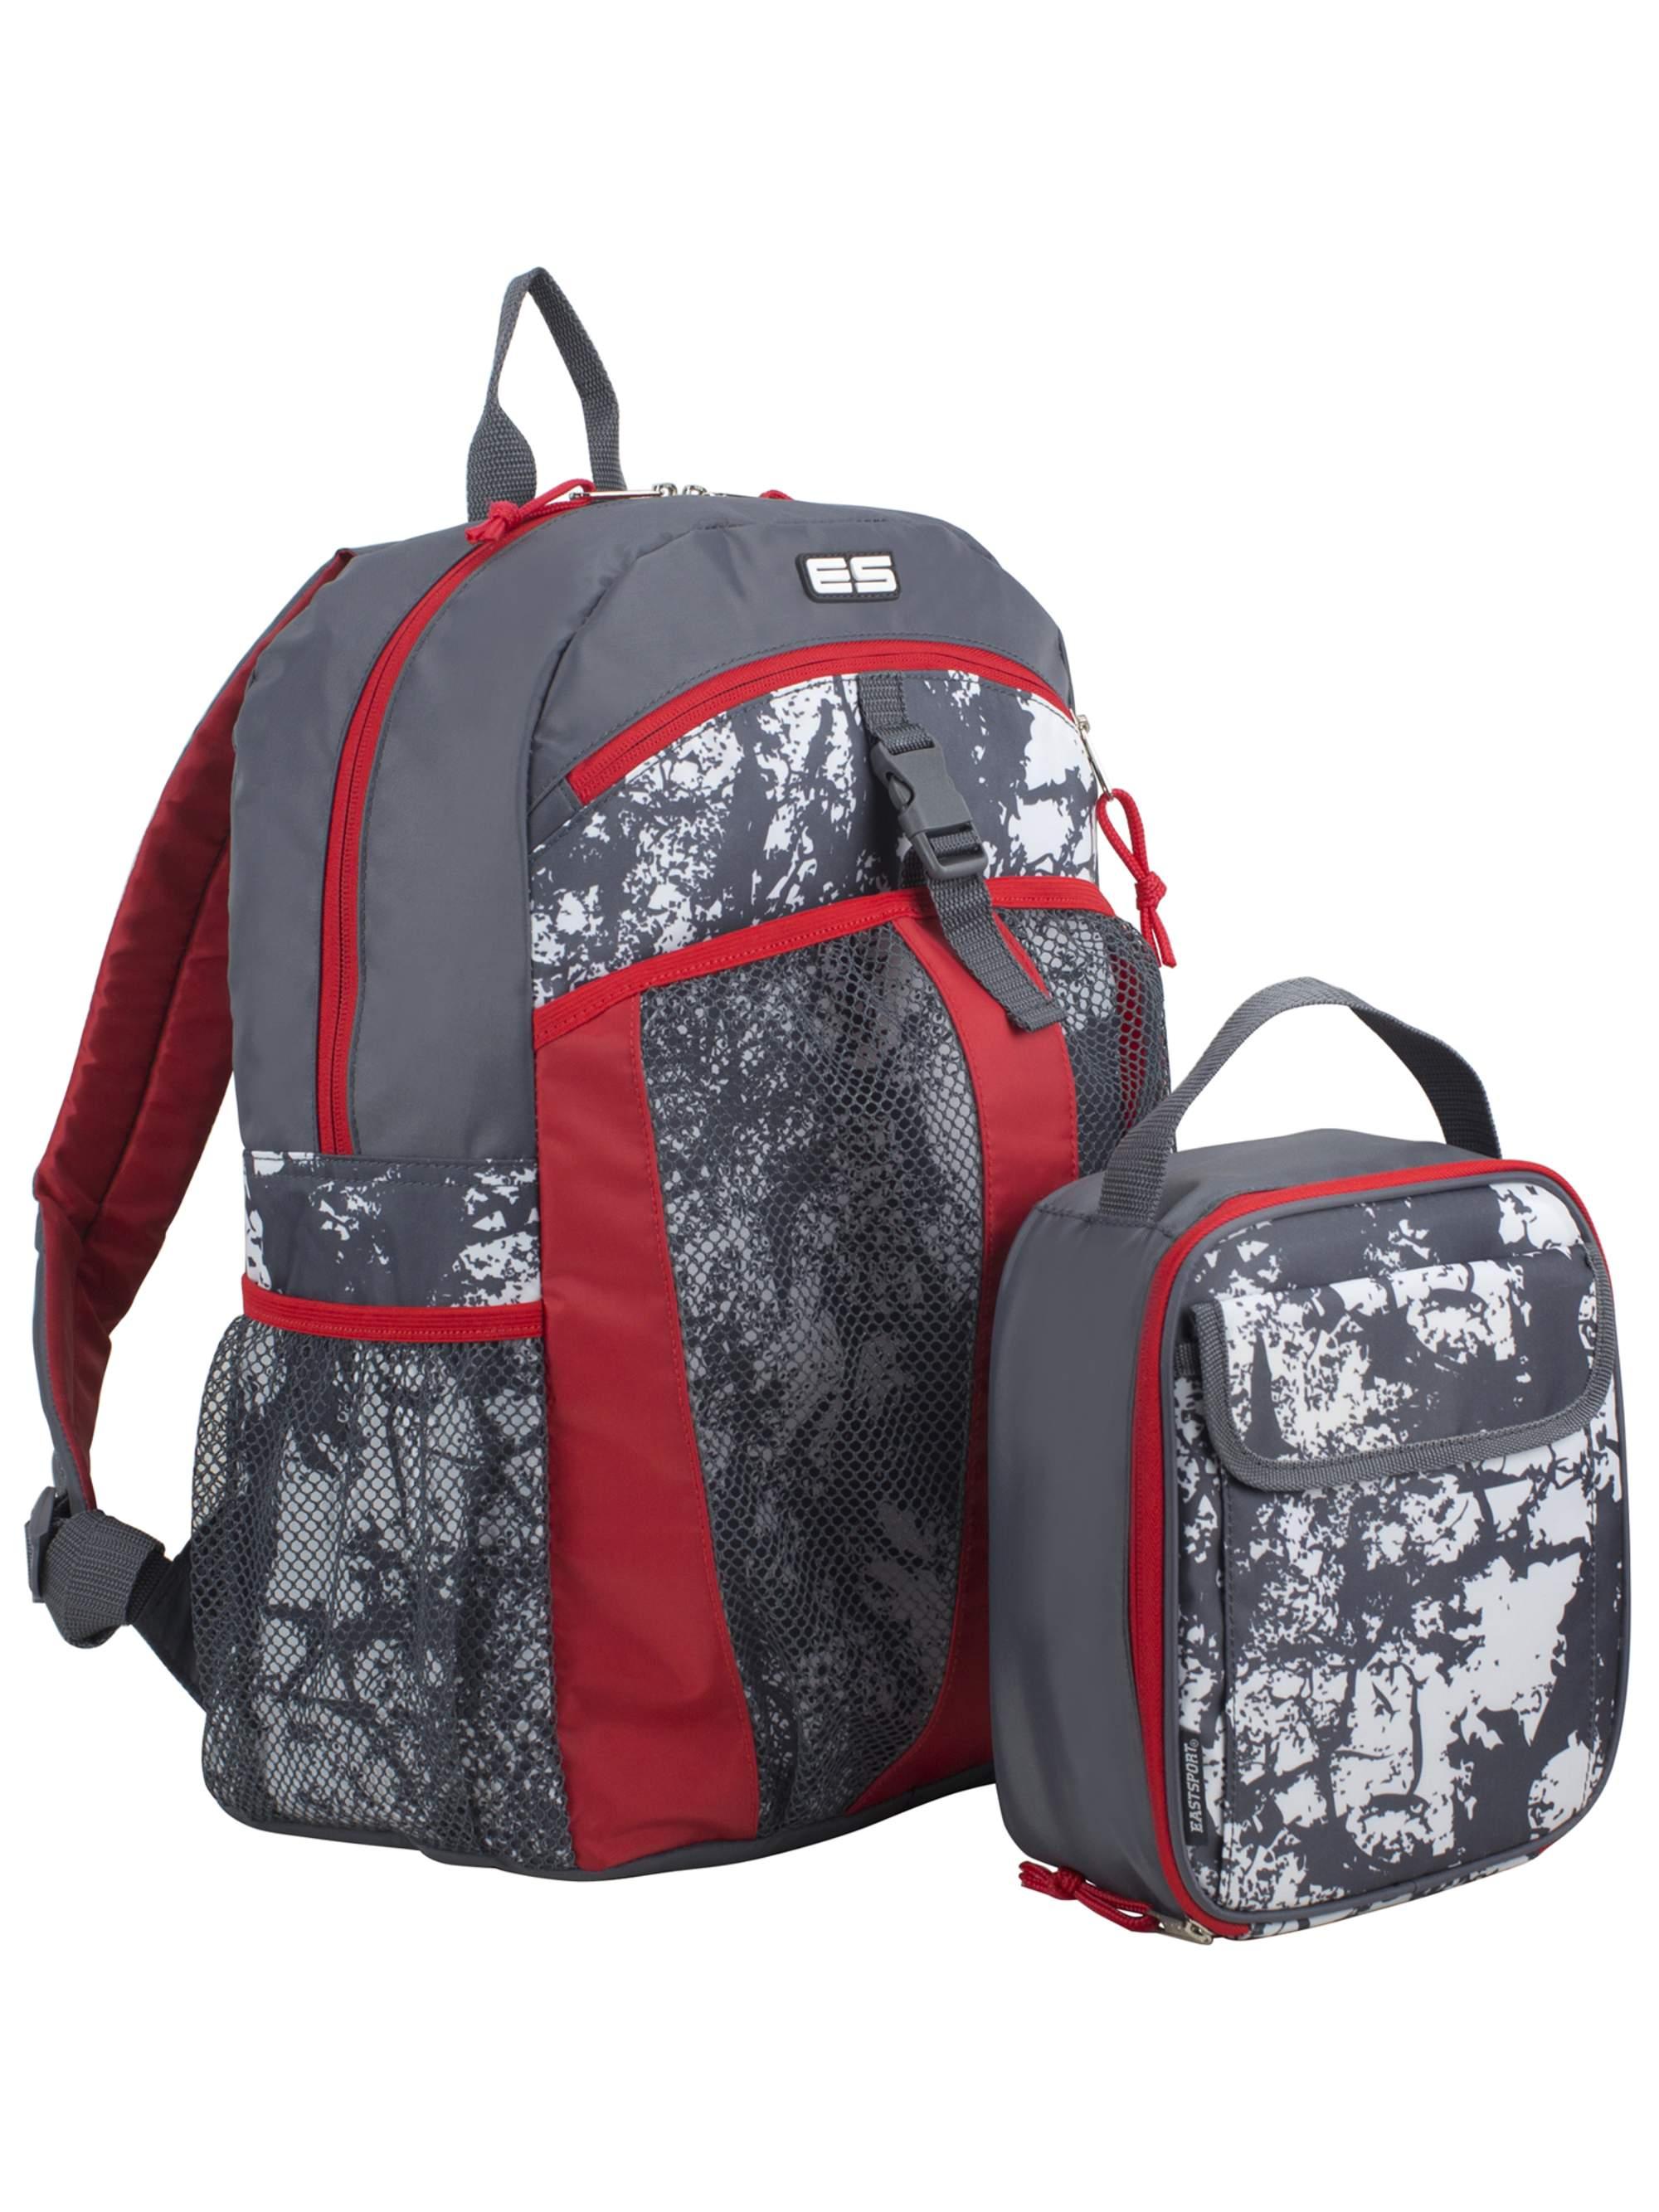 Eastsport Backpack with Bonus Matching Lunch Bag